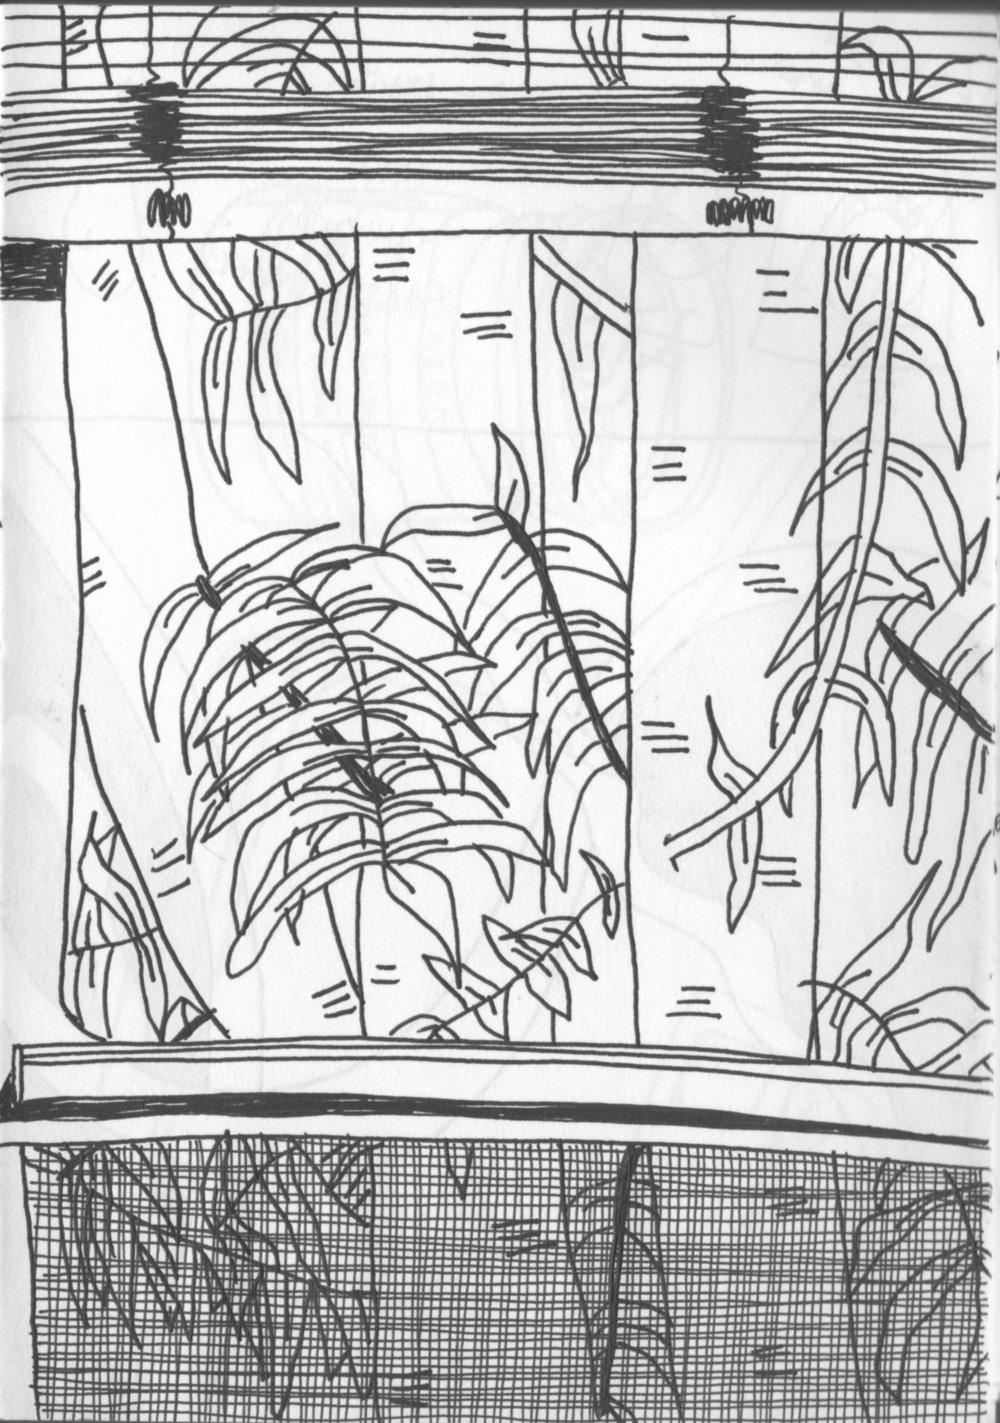 Scan 5.jpeg